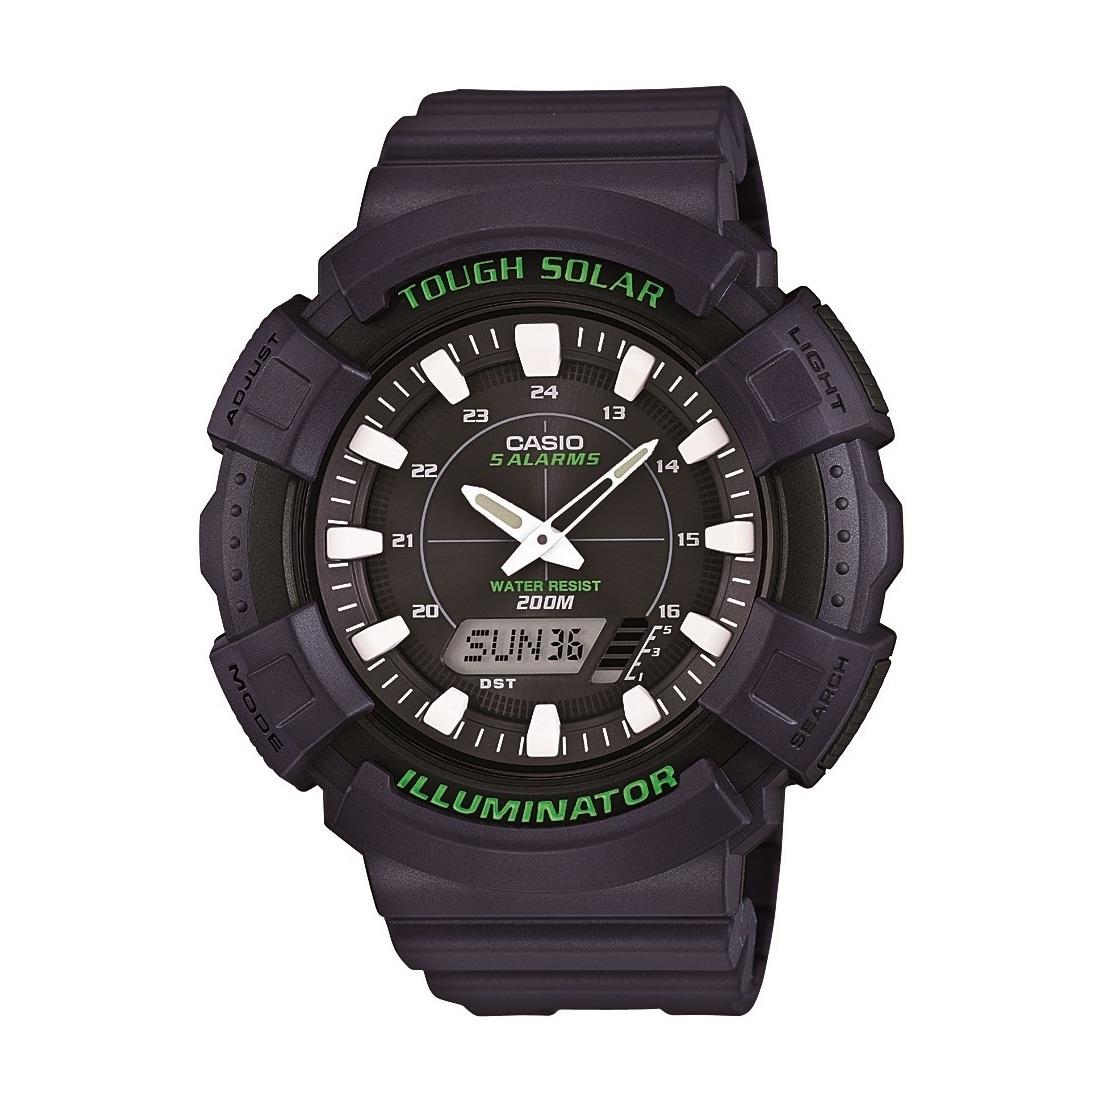 Casio Mens Solar Watch with Black Resin Band (Black), Siz...